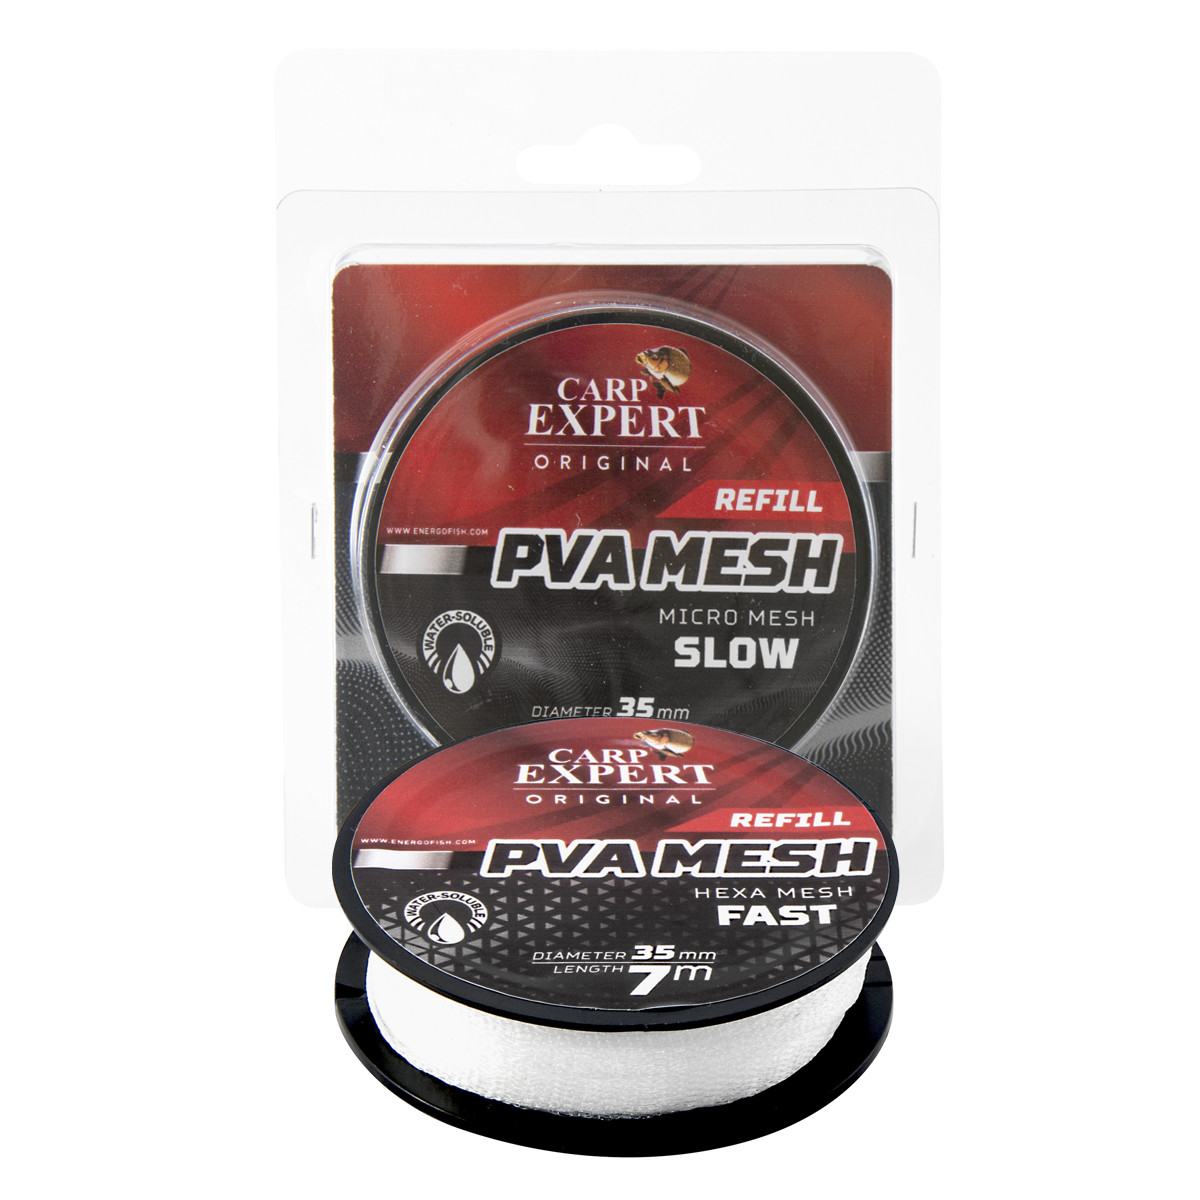 ПВА-сетка 7м 25мм на шпуле Energofish Carp Expert PVA Refill Micro Mesh Slow (30141225)